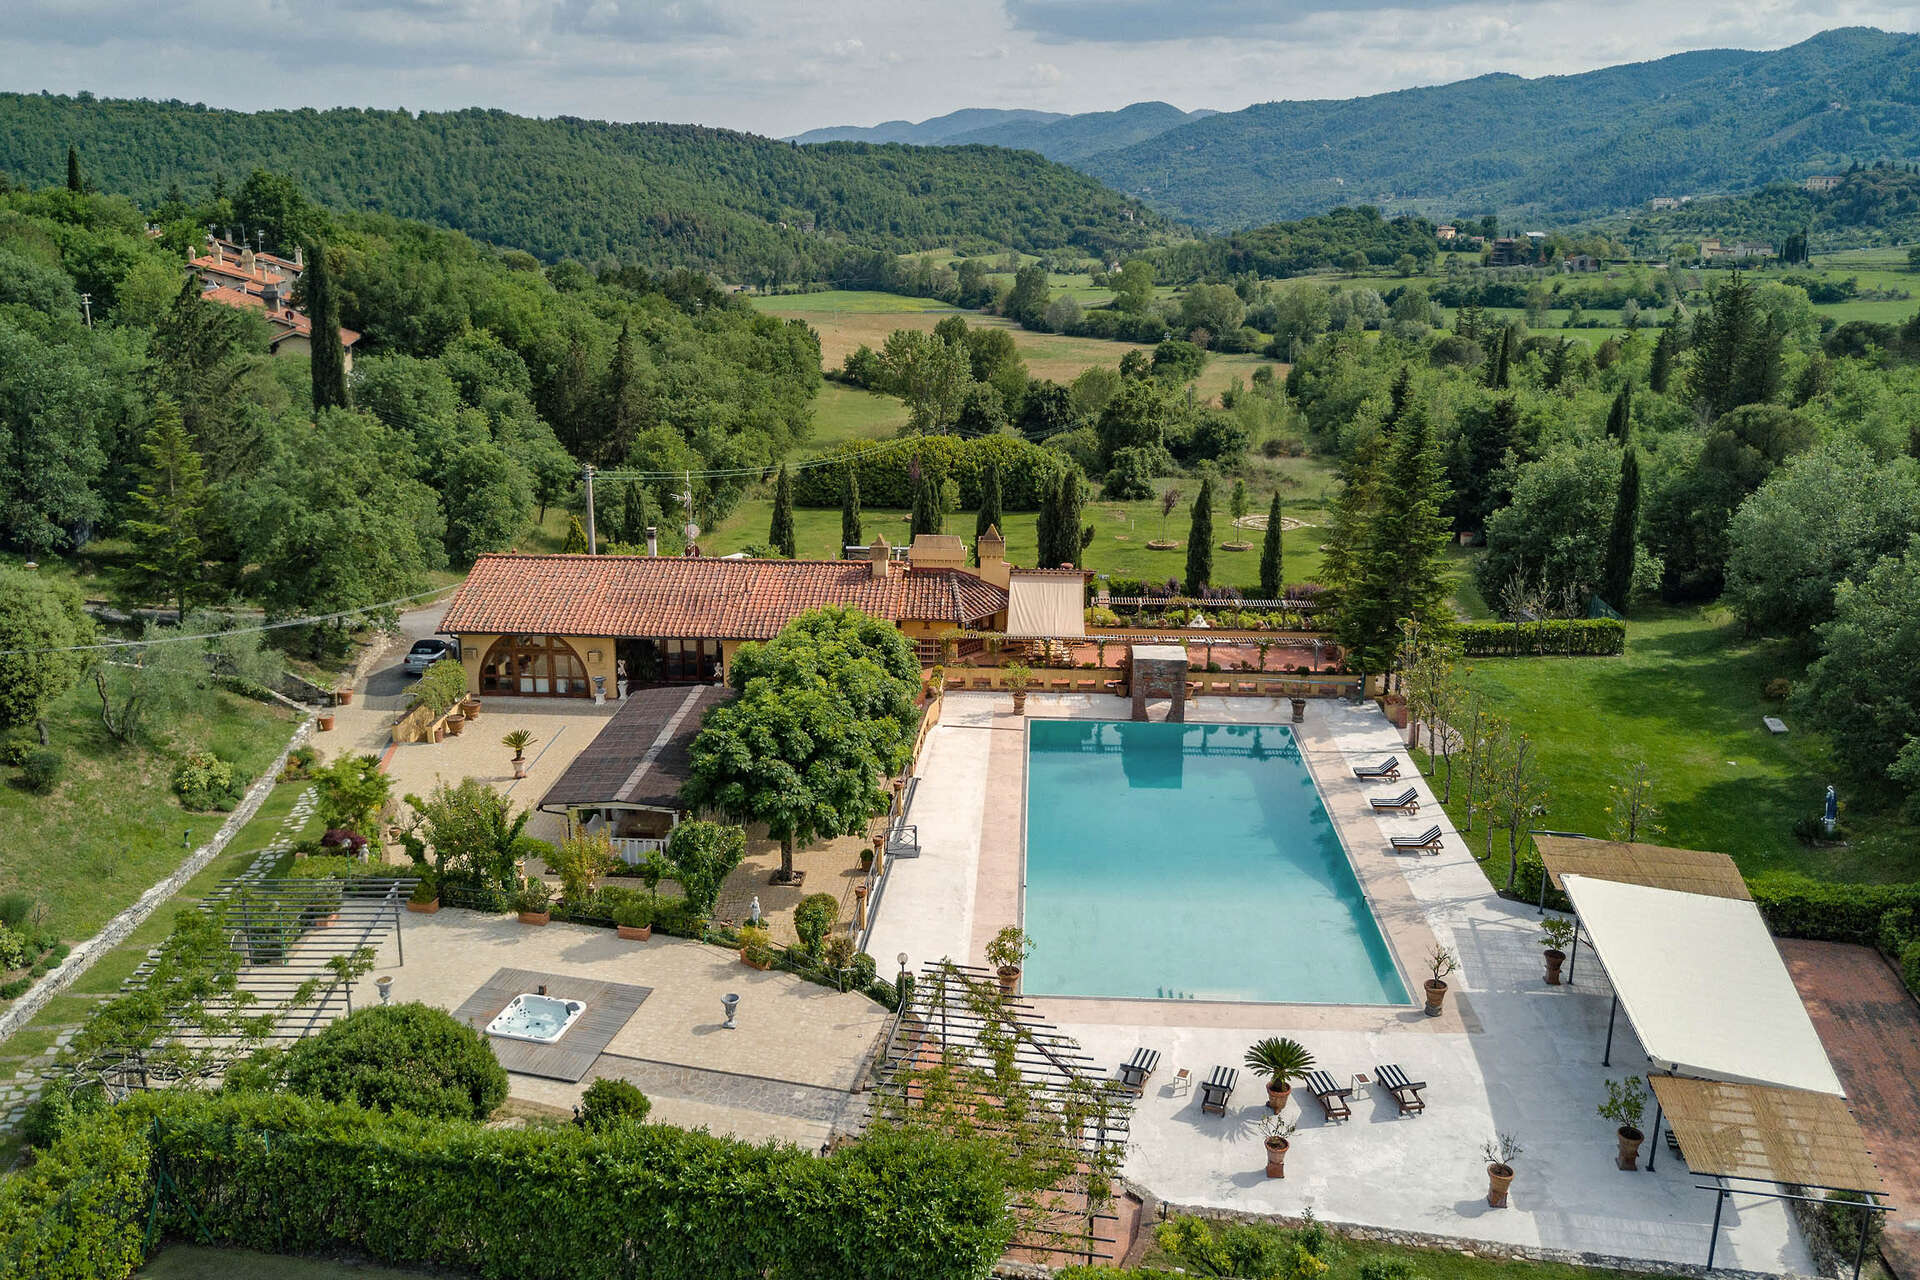 Luxury vacation rentals europe - Italy - Tuscany - Chia nti - Eos - Image 1/24